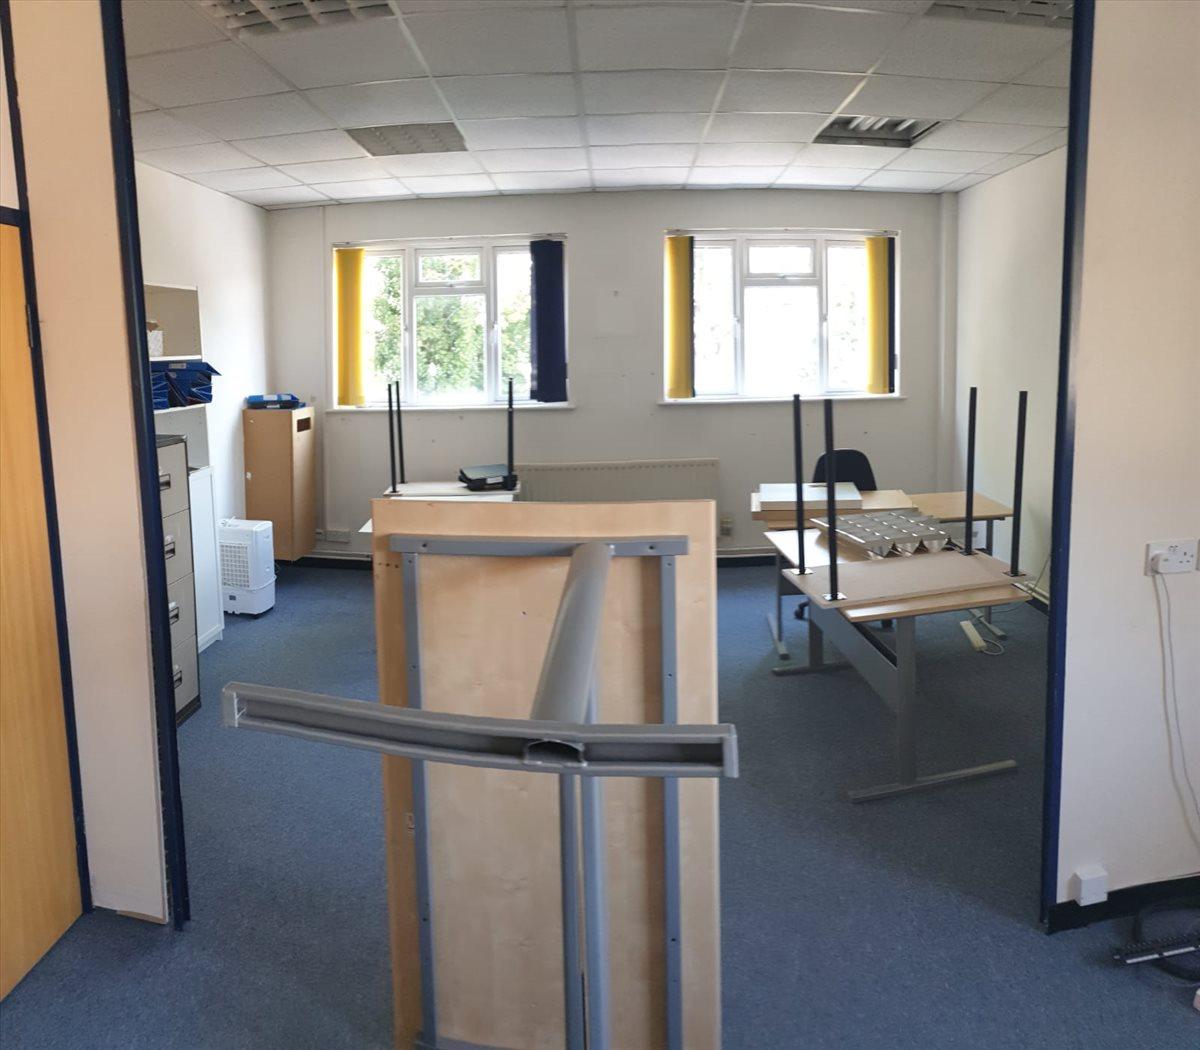 292 Worton Road Office Space